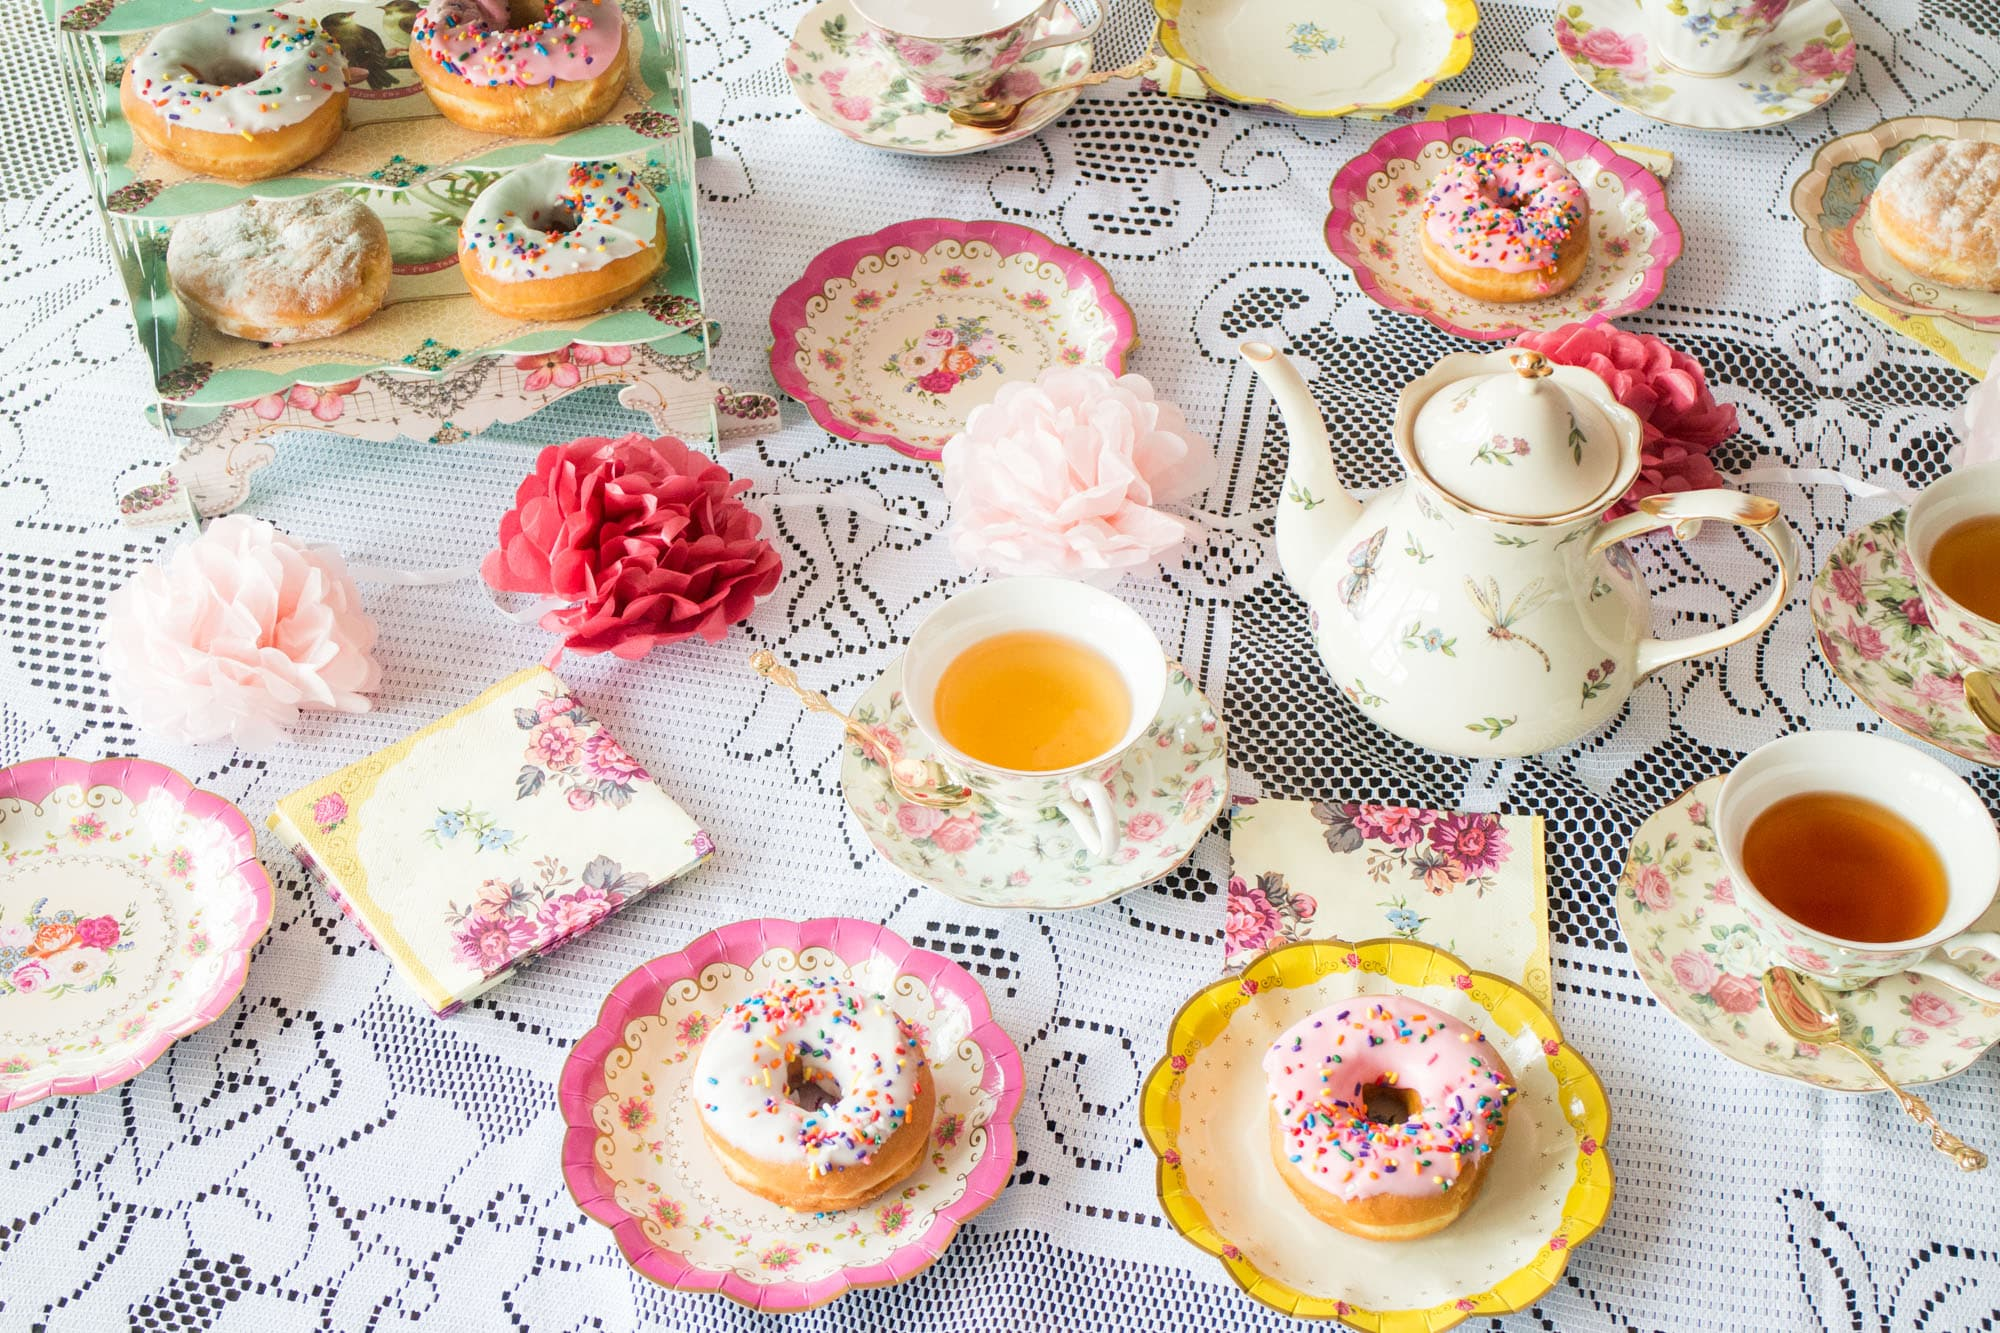 Grandparents grandchildren's mad hatters tea party